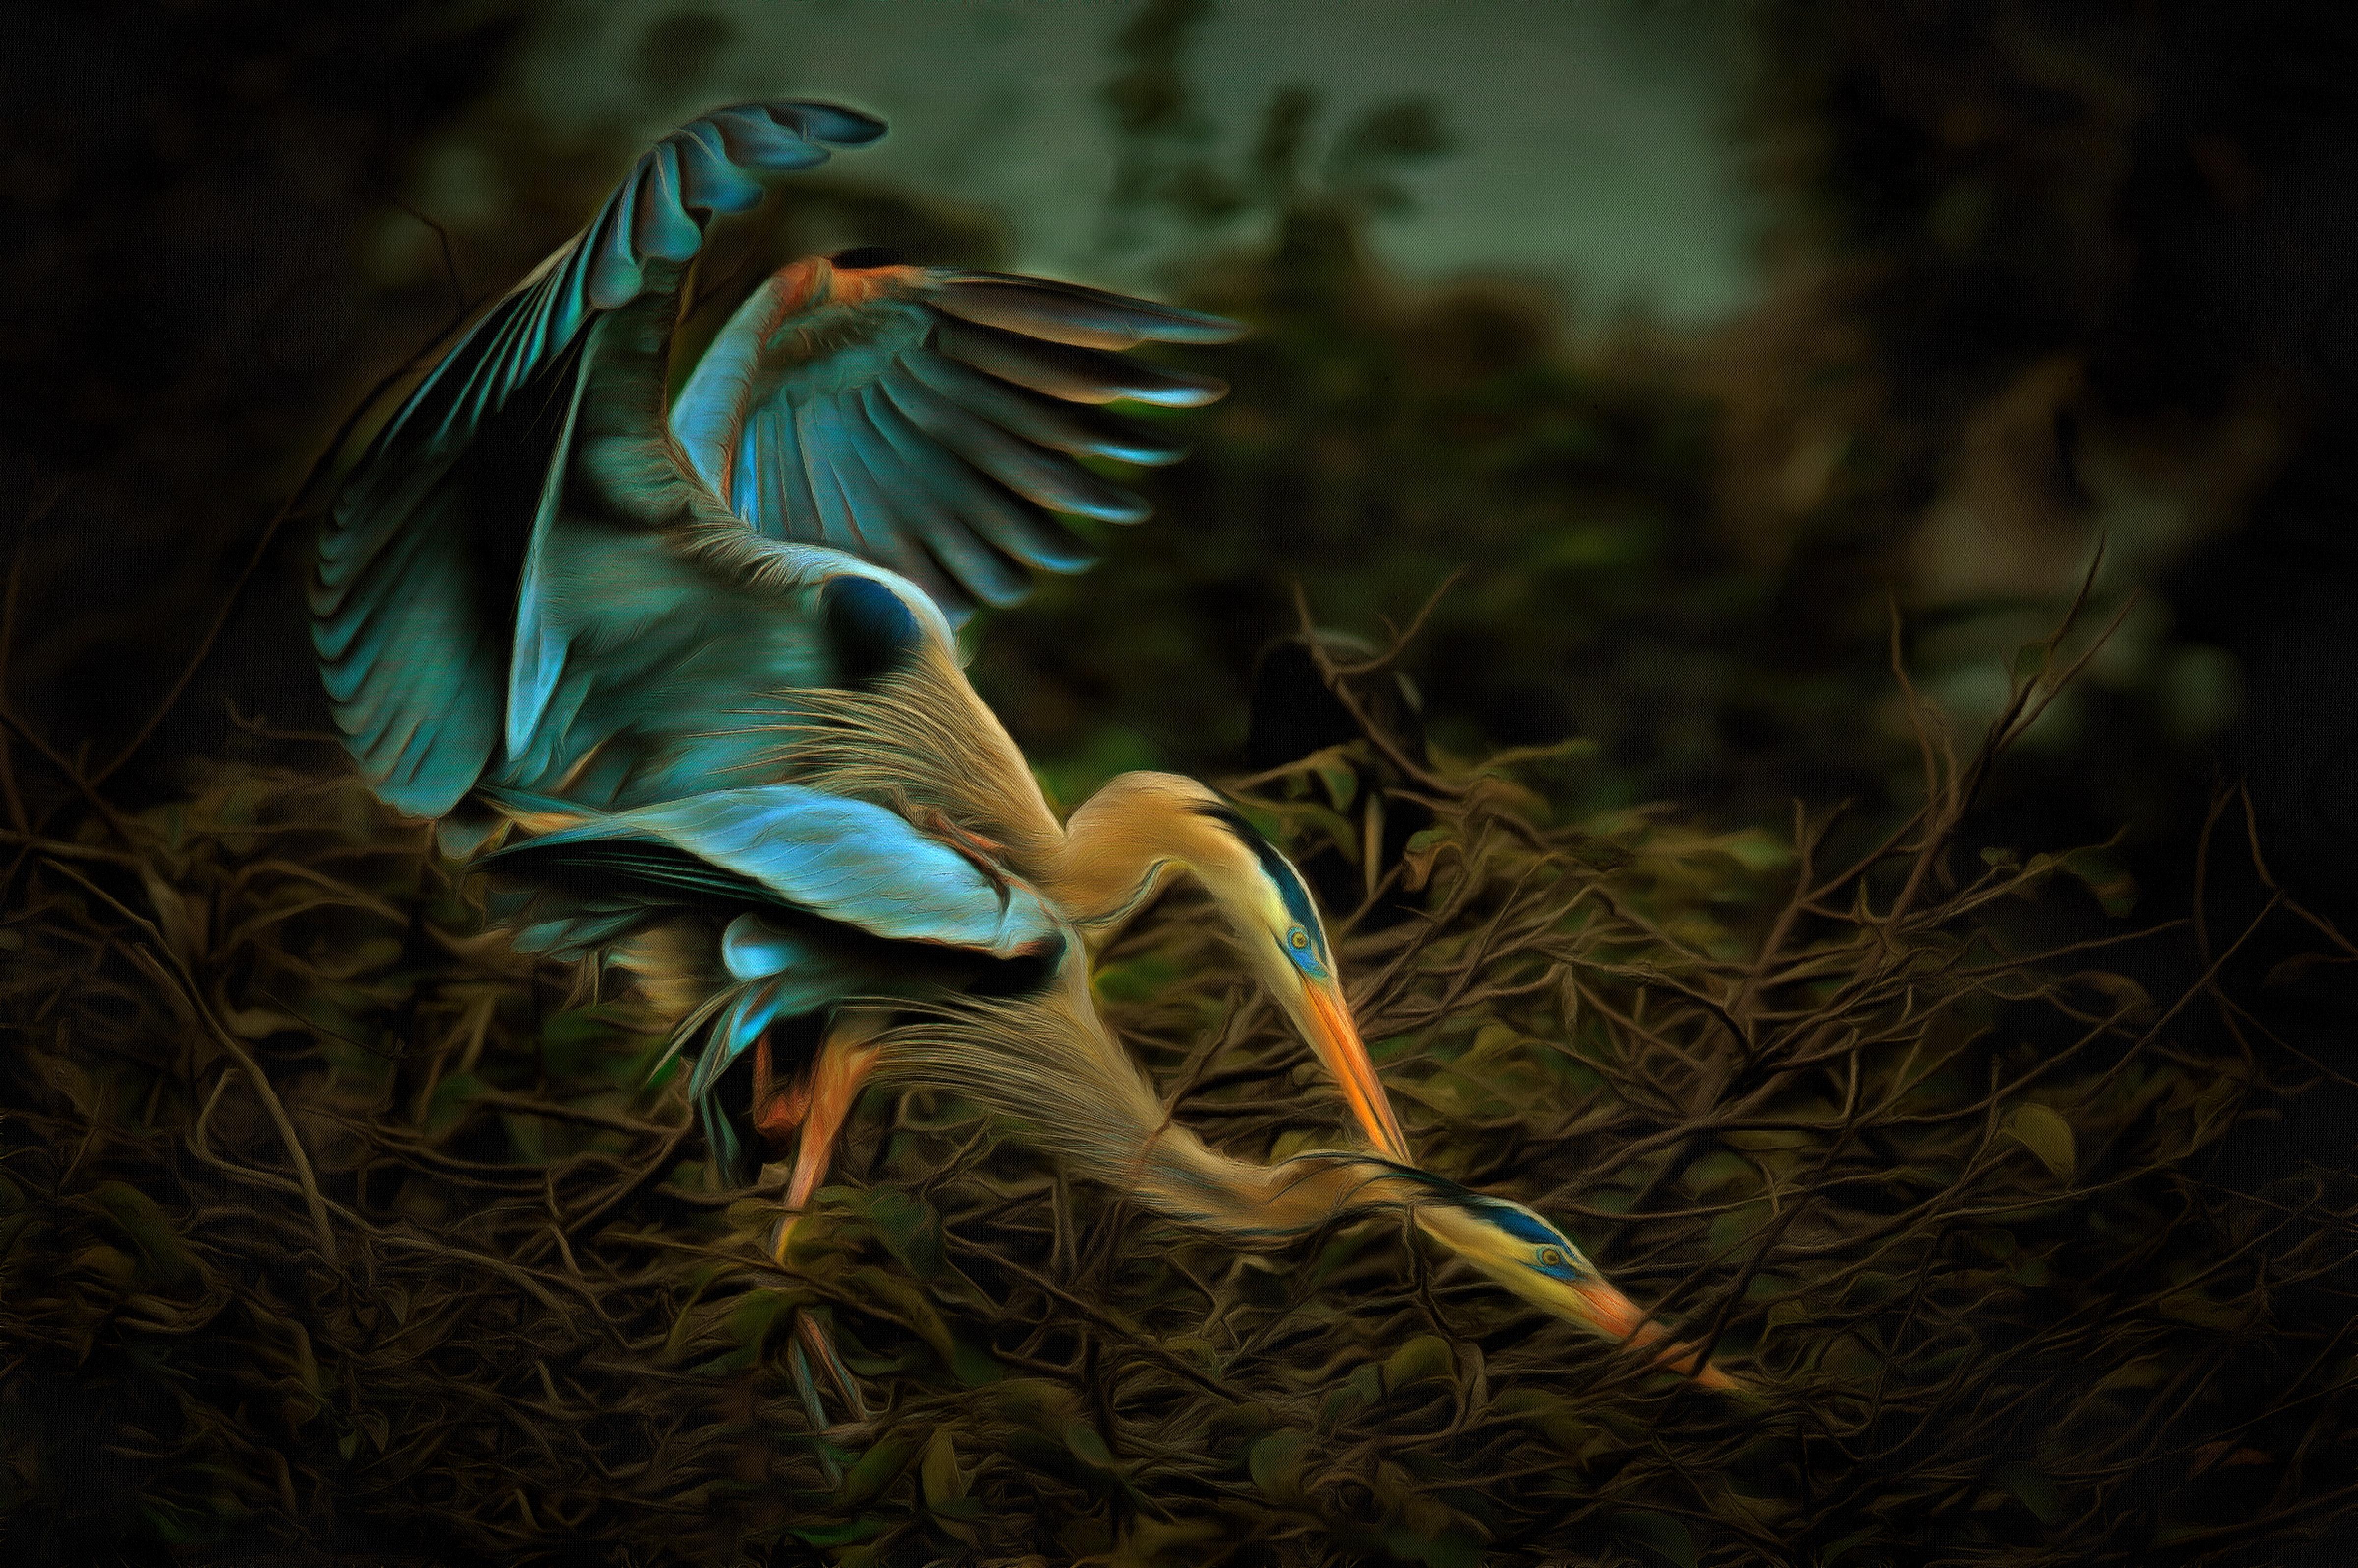 Day-4B_Heron_Love Reward for a good stick